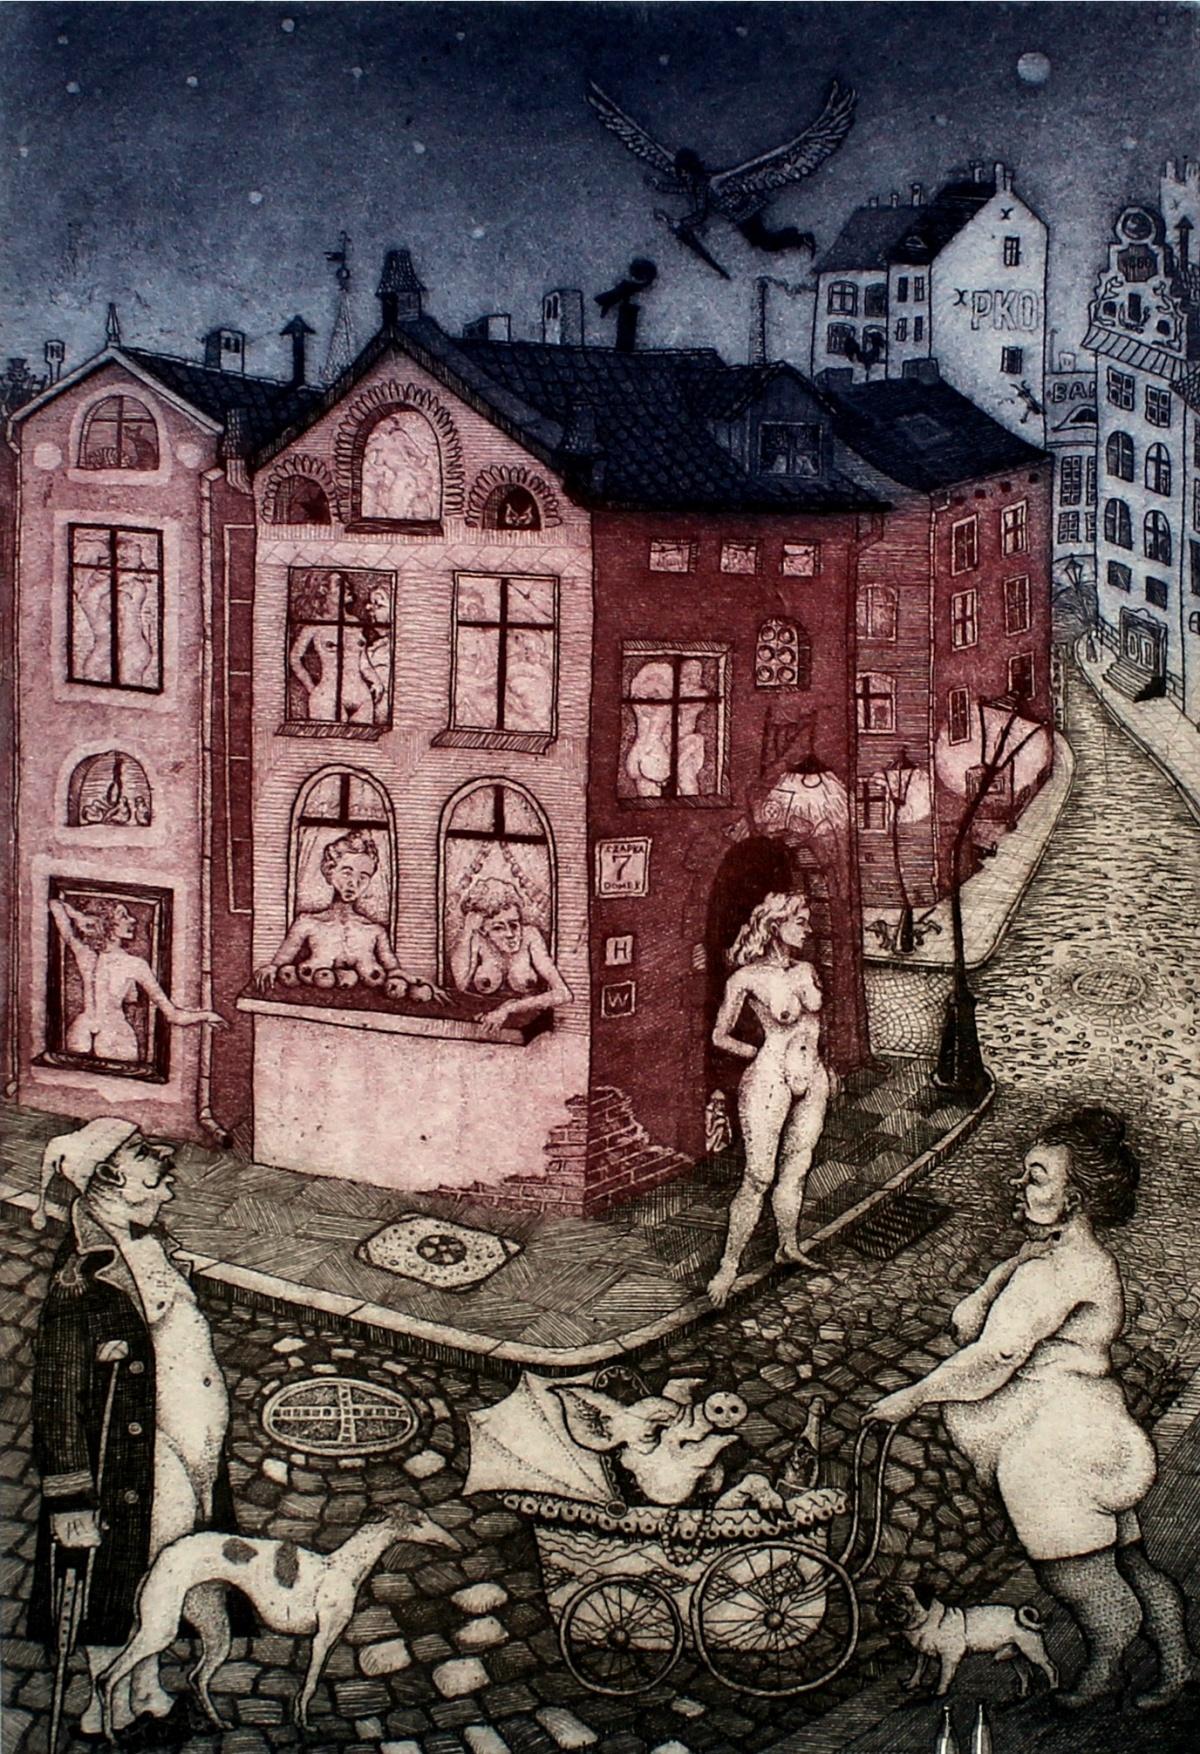 Regular Day - XXI century, Figurative etching, Colourful, Nude, Town scene